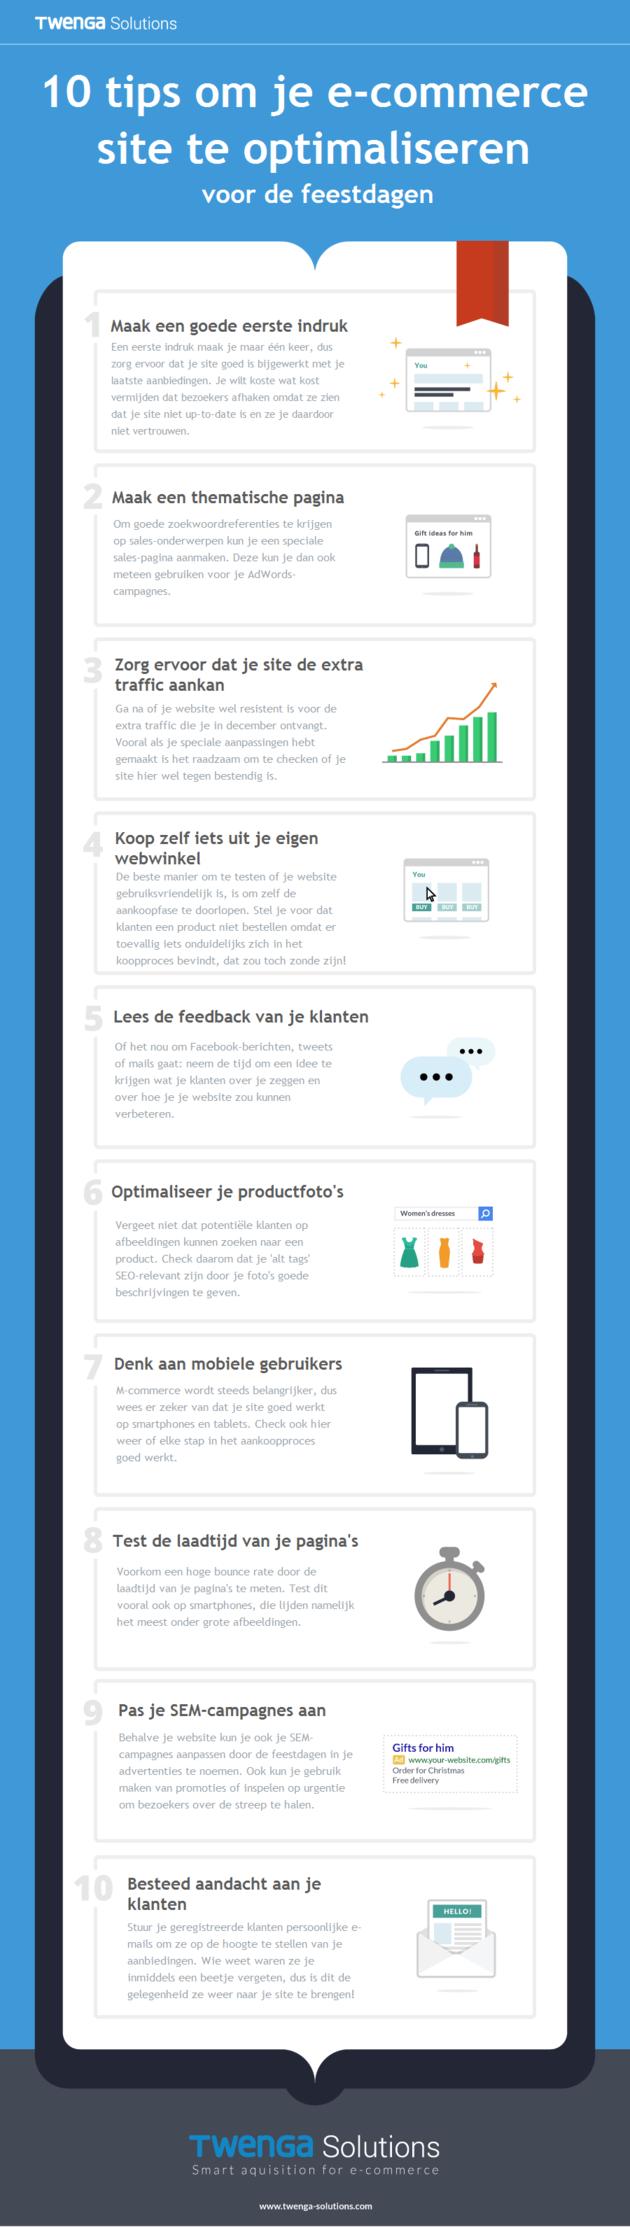 ecommerce-website-optimaliseren-infographic